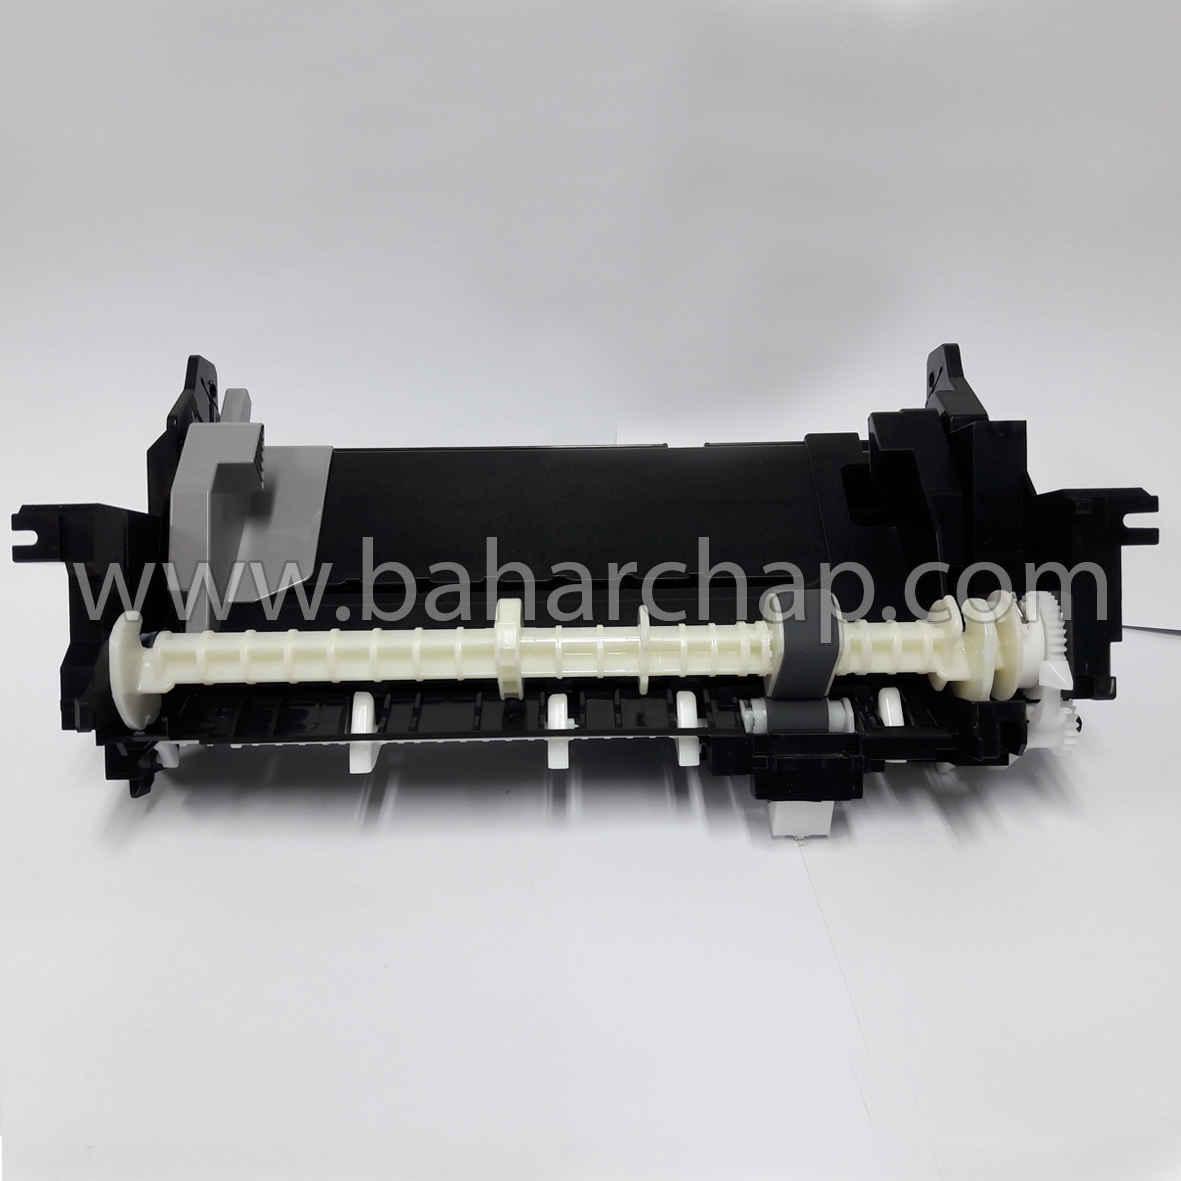 فروشگاه و خدمات اینترنتی بهارچاپ اصفهان-یونیت کاغذ کش اپسون T50,P50,L800,L805 - ASF Unit Epson T50,P50,L800,L805